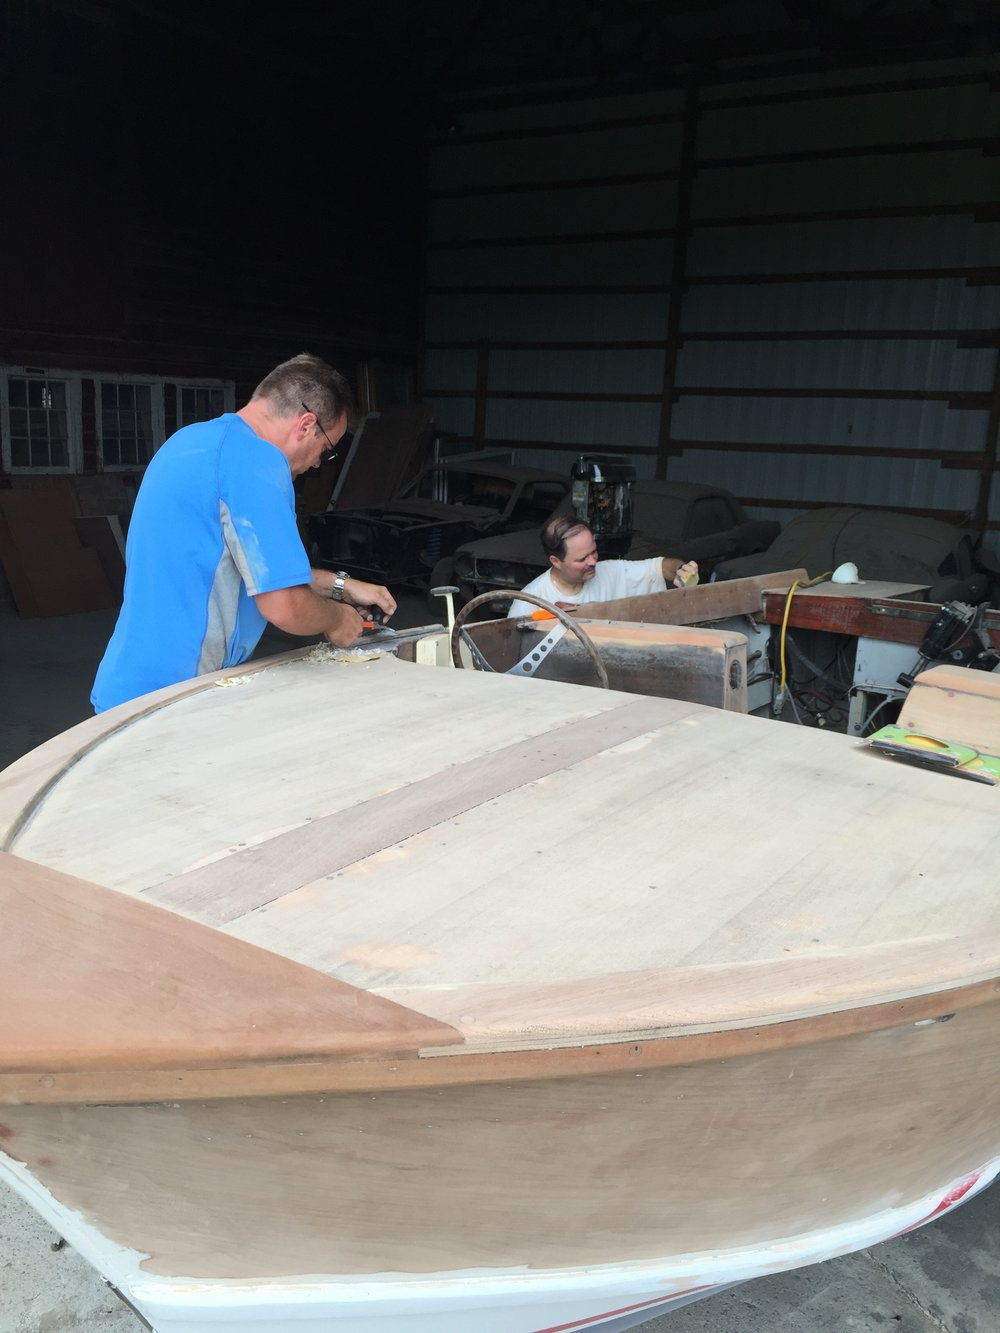 Alec Halstead's 1961 Skee Craft undergoing restoration